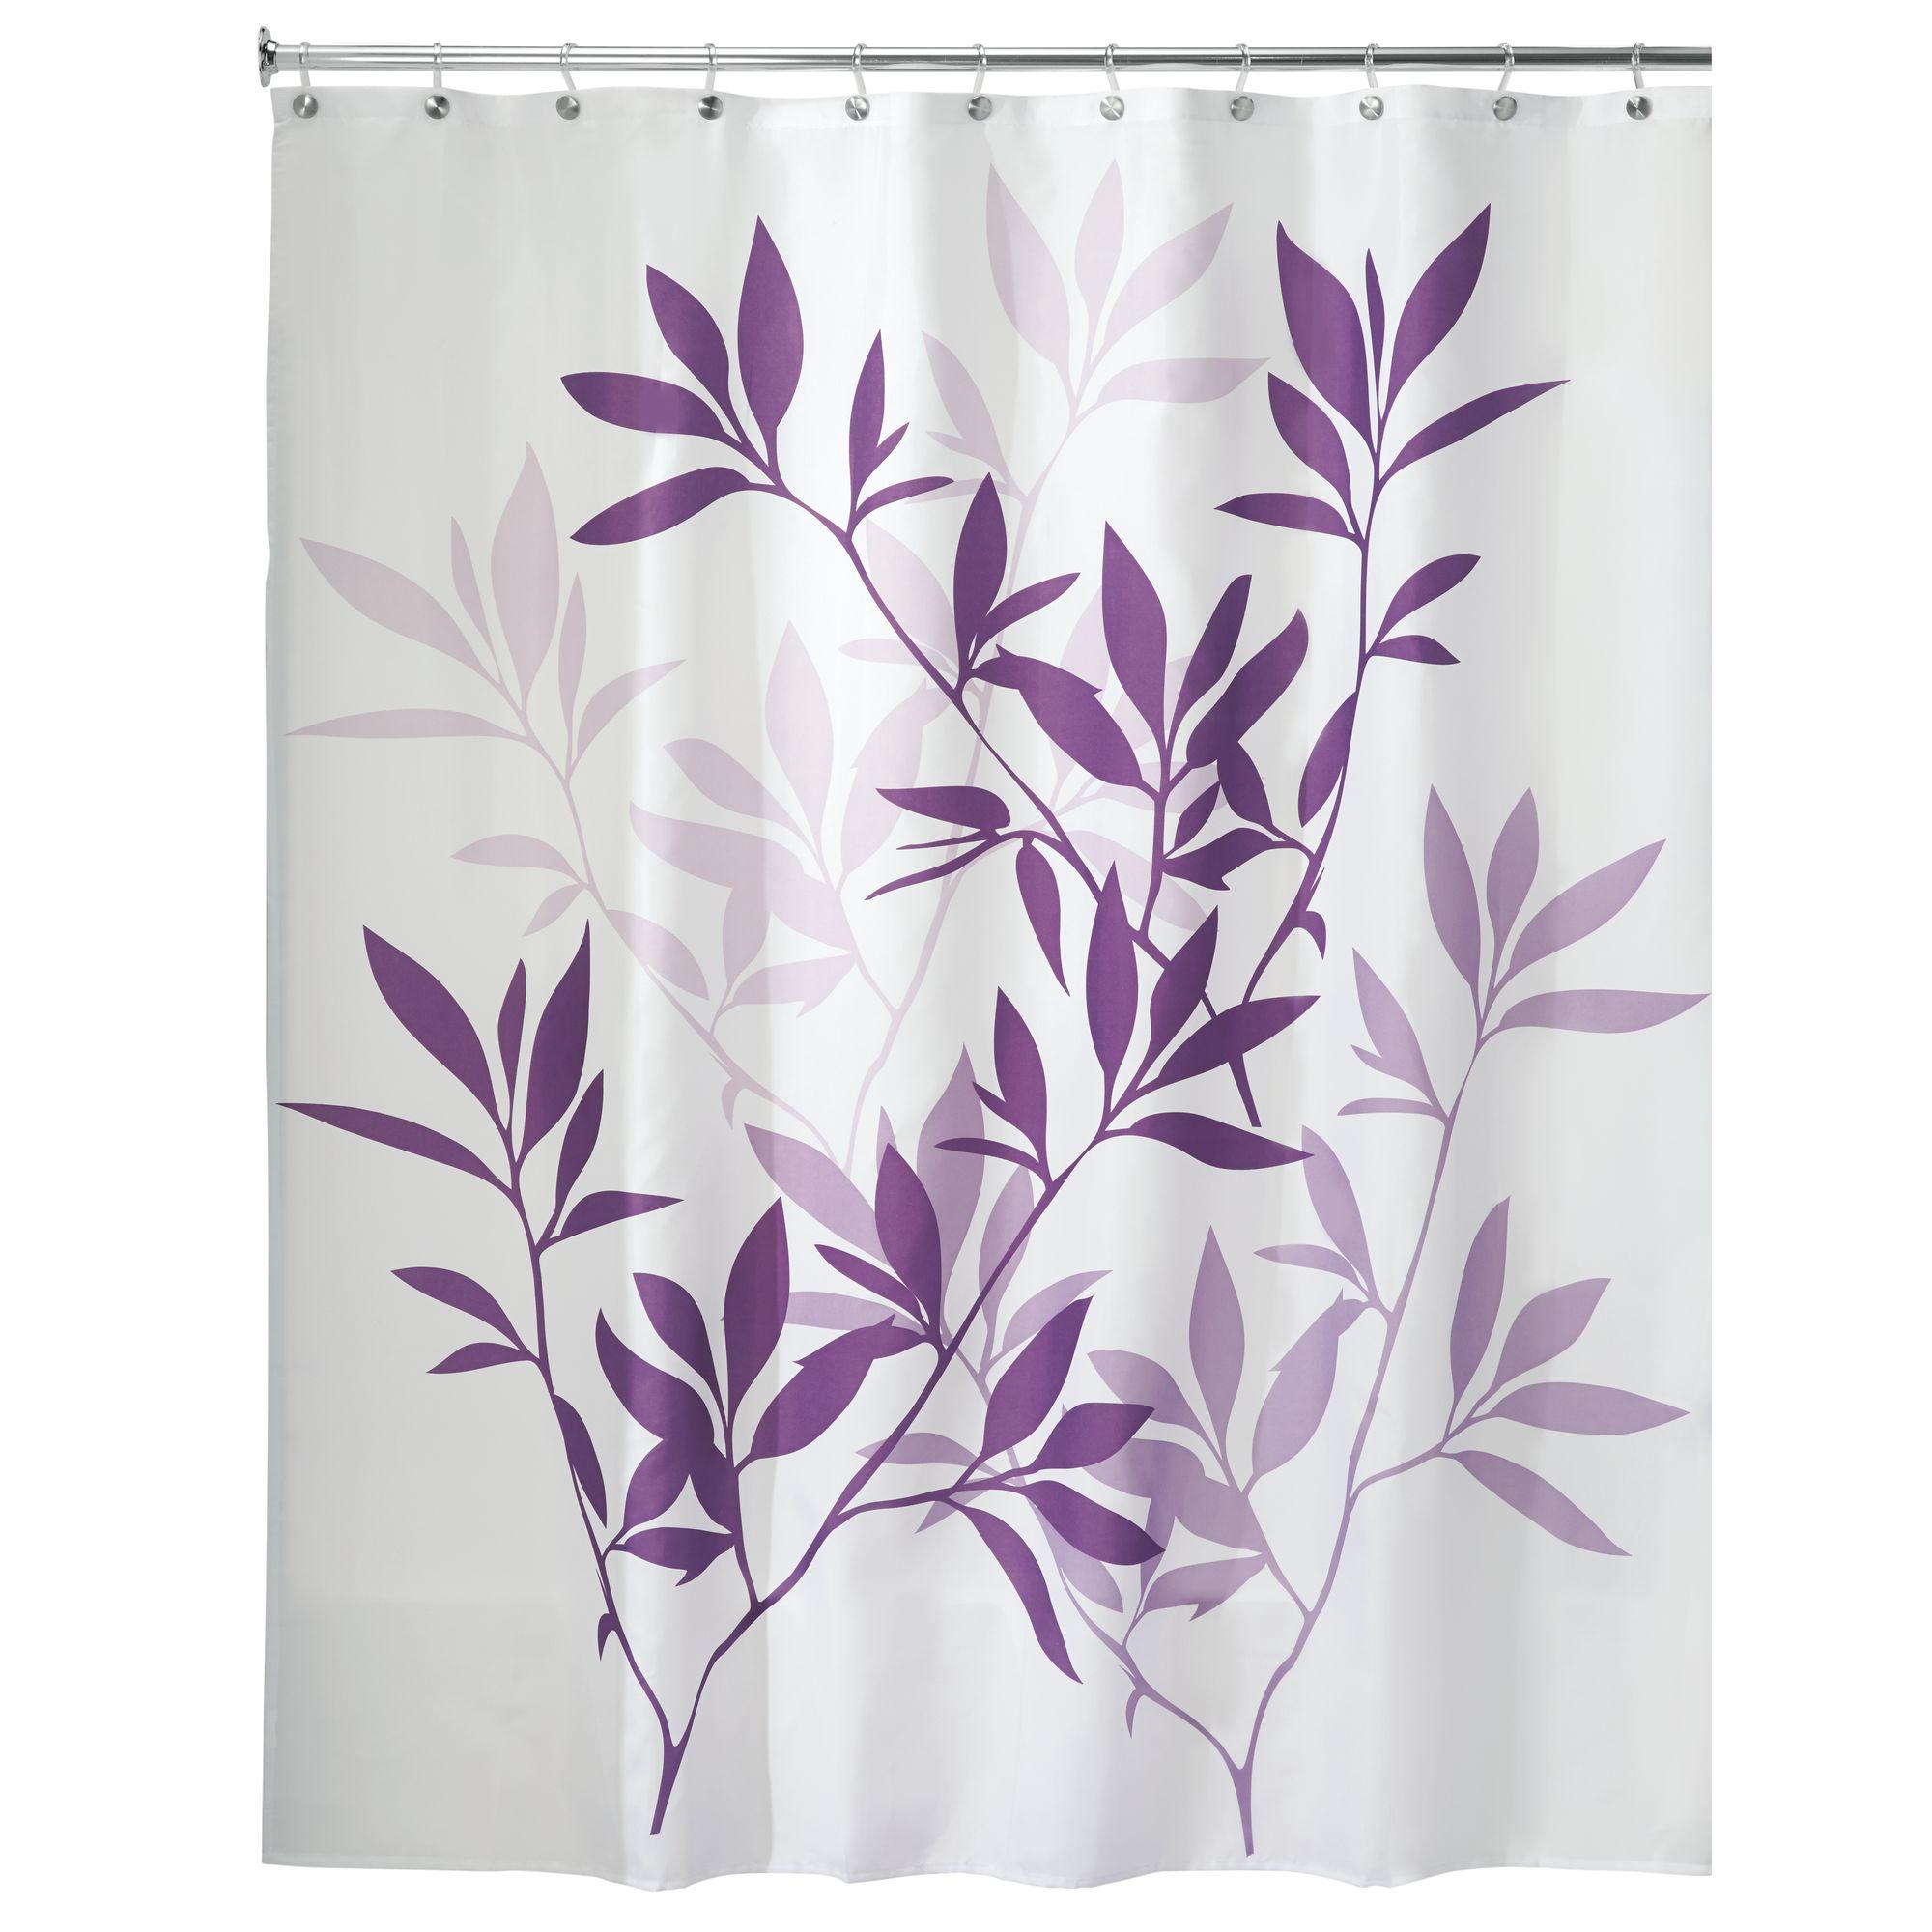 Sympathise latex leaf shower curtain commit